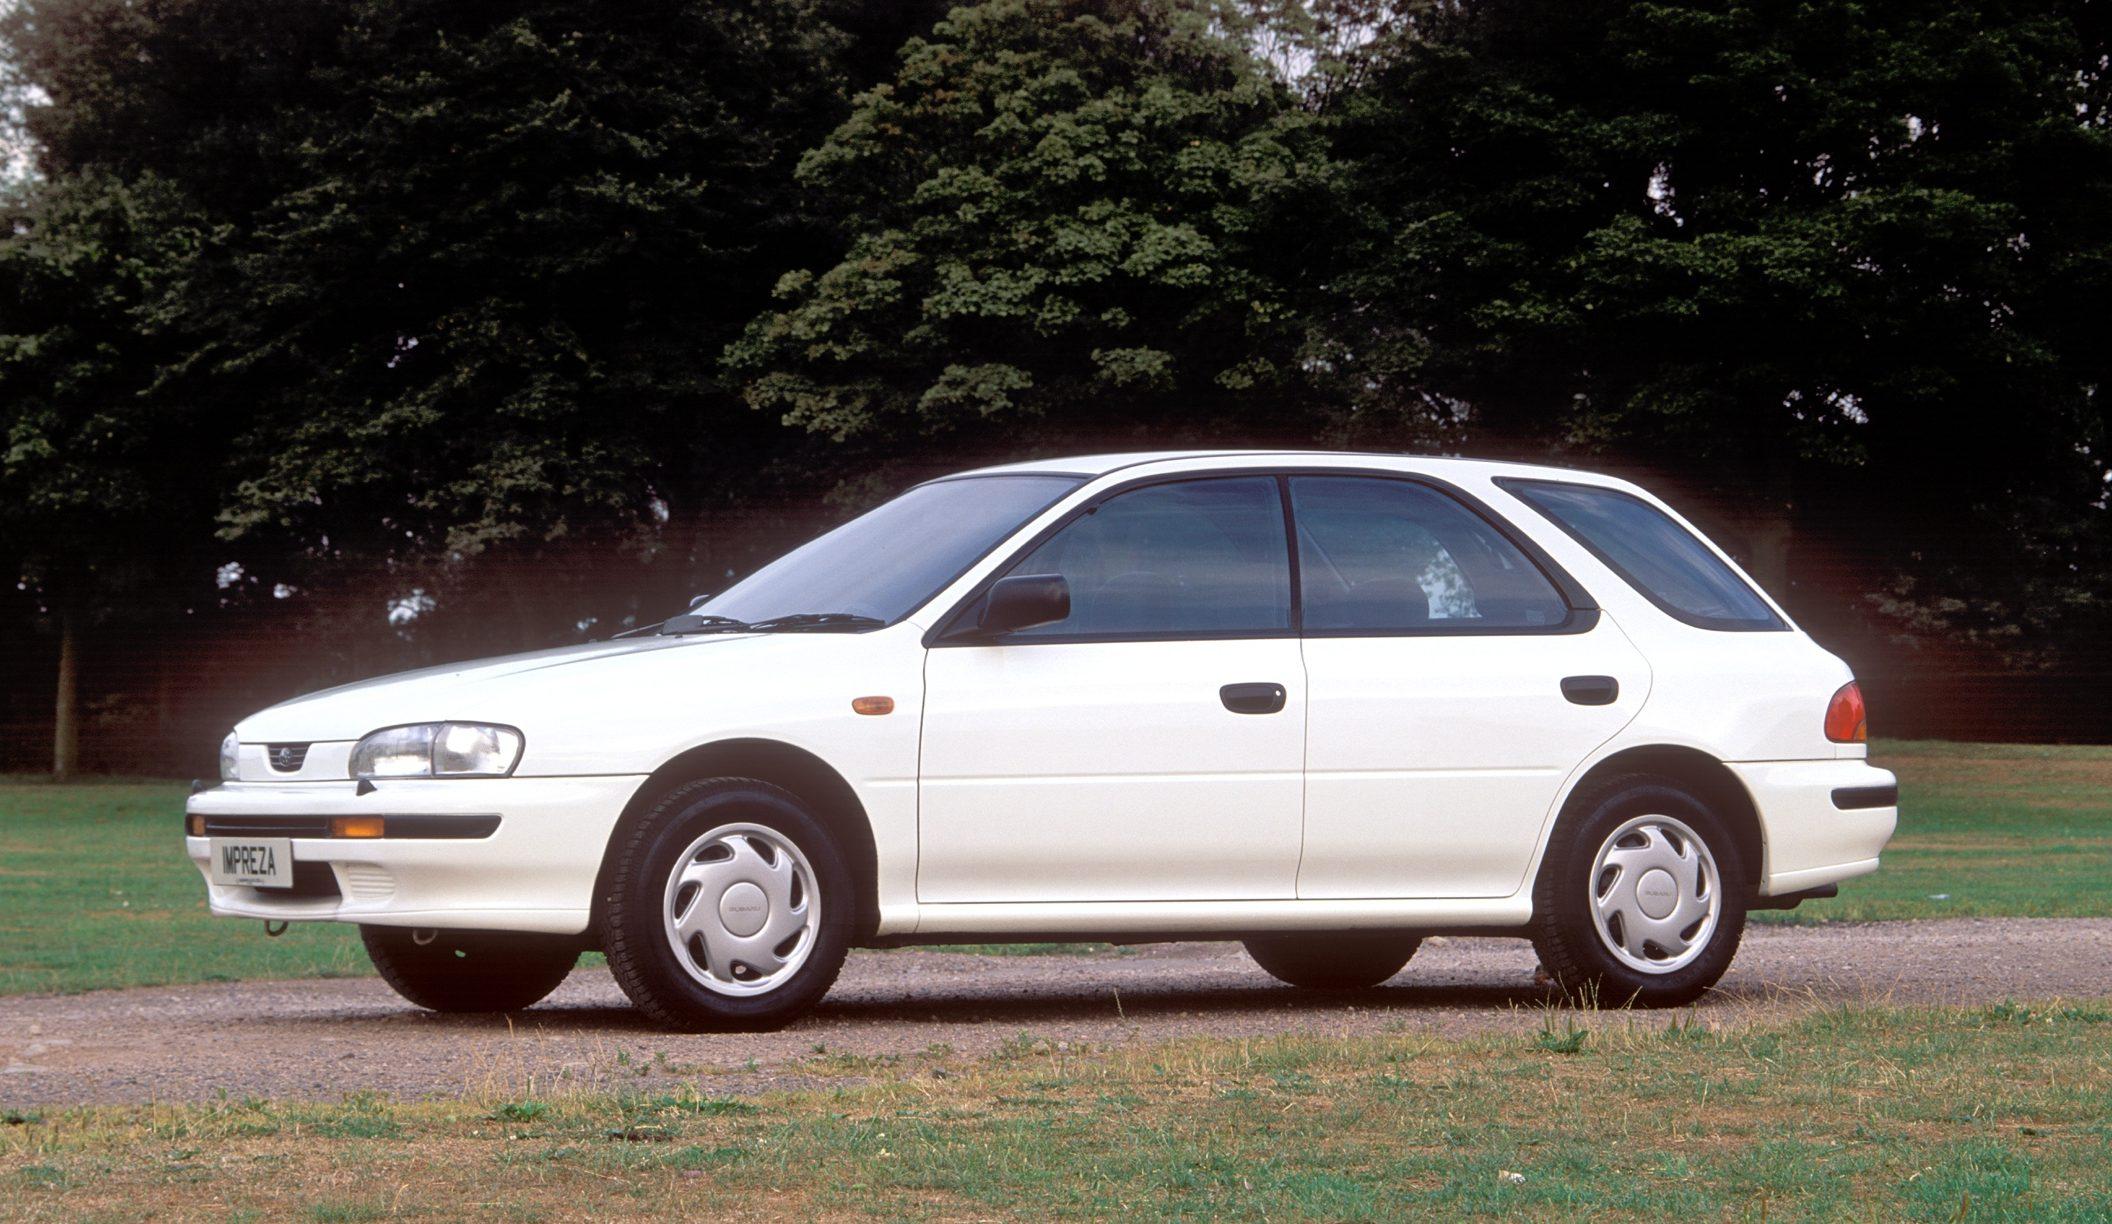 1993 Subaru Impreza 1.6 GL AWD 5 Door